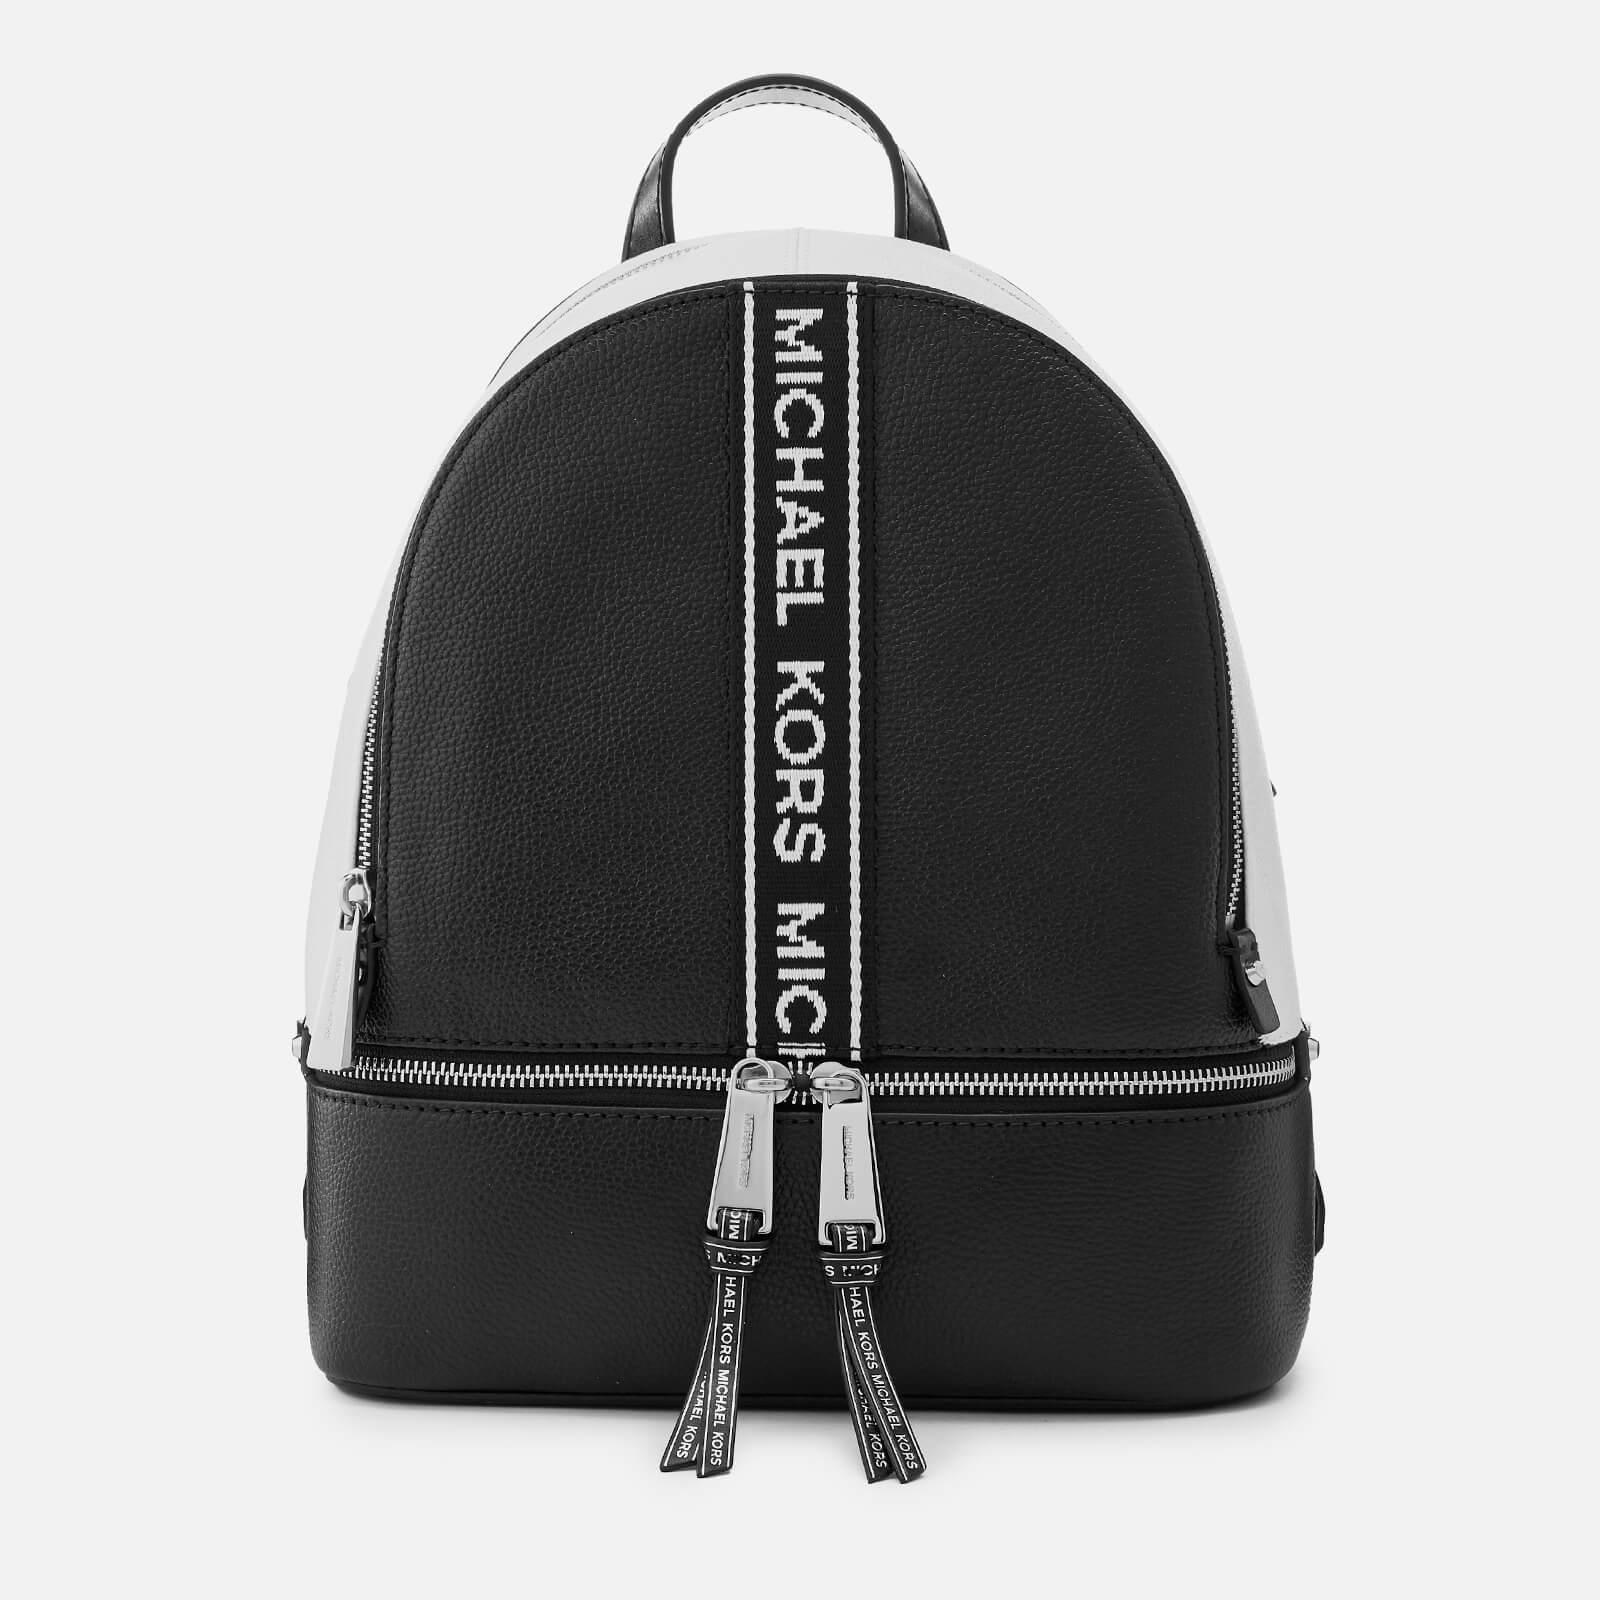 f4963ee64f0d MICHAEL MICHAEL KORS Women s Rhea Zip Backpack - Black White Womens  Accessories